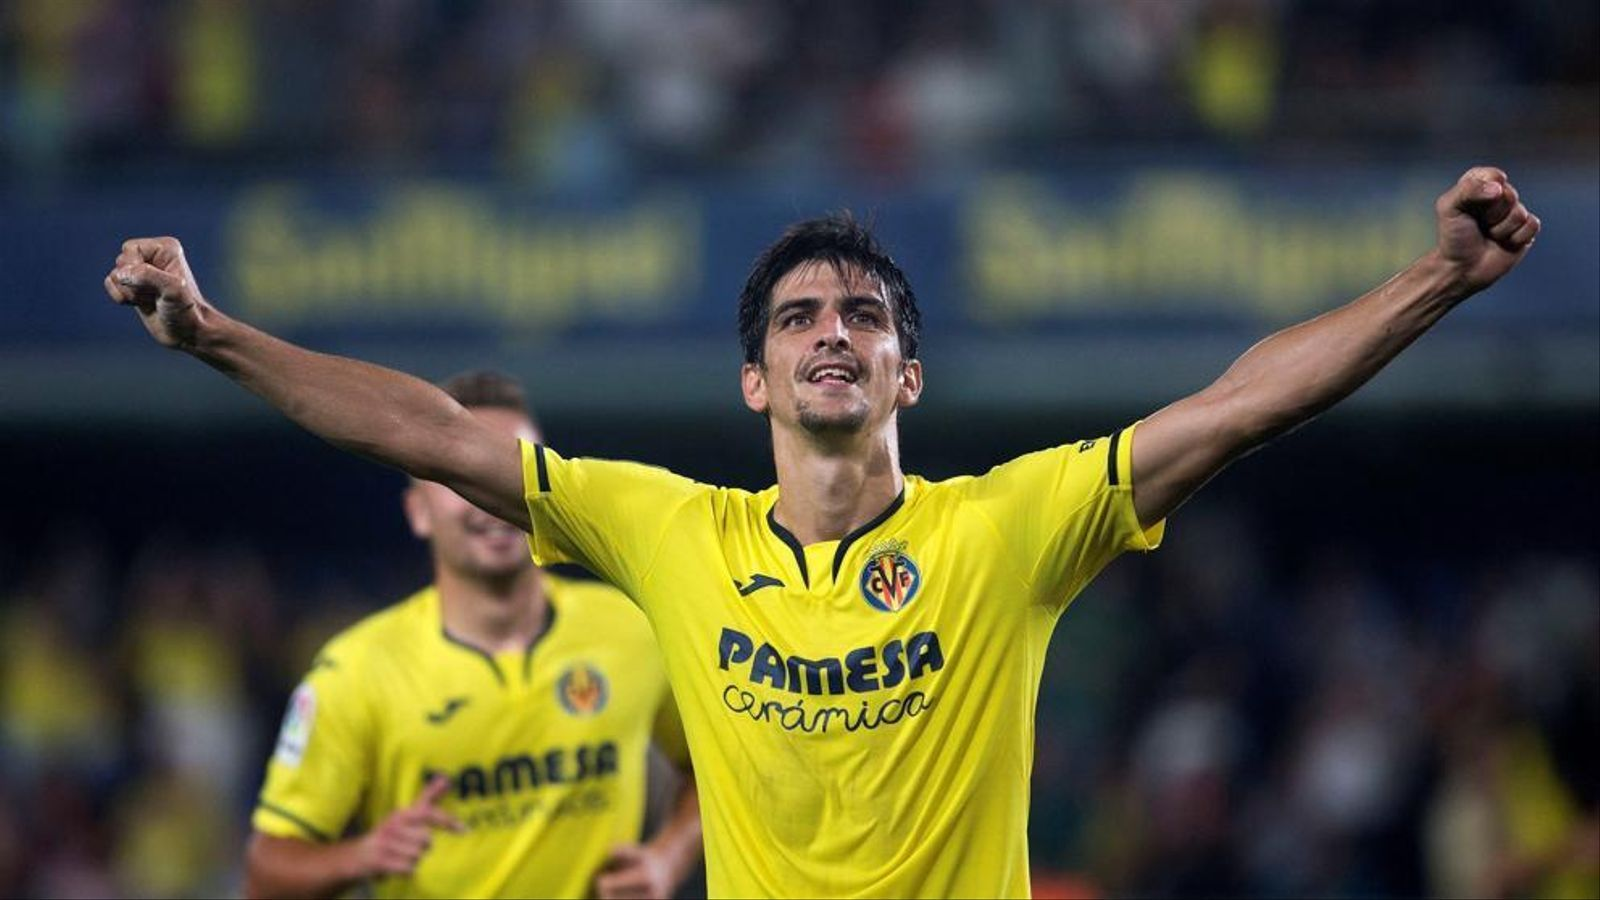 Gerard Moreno will reach his 200th match in the League against Barça